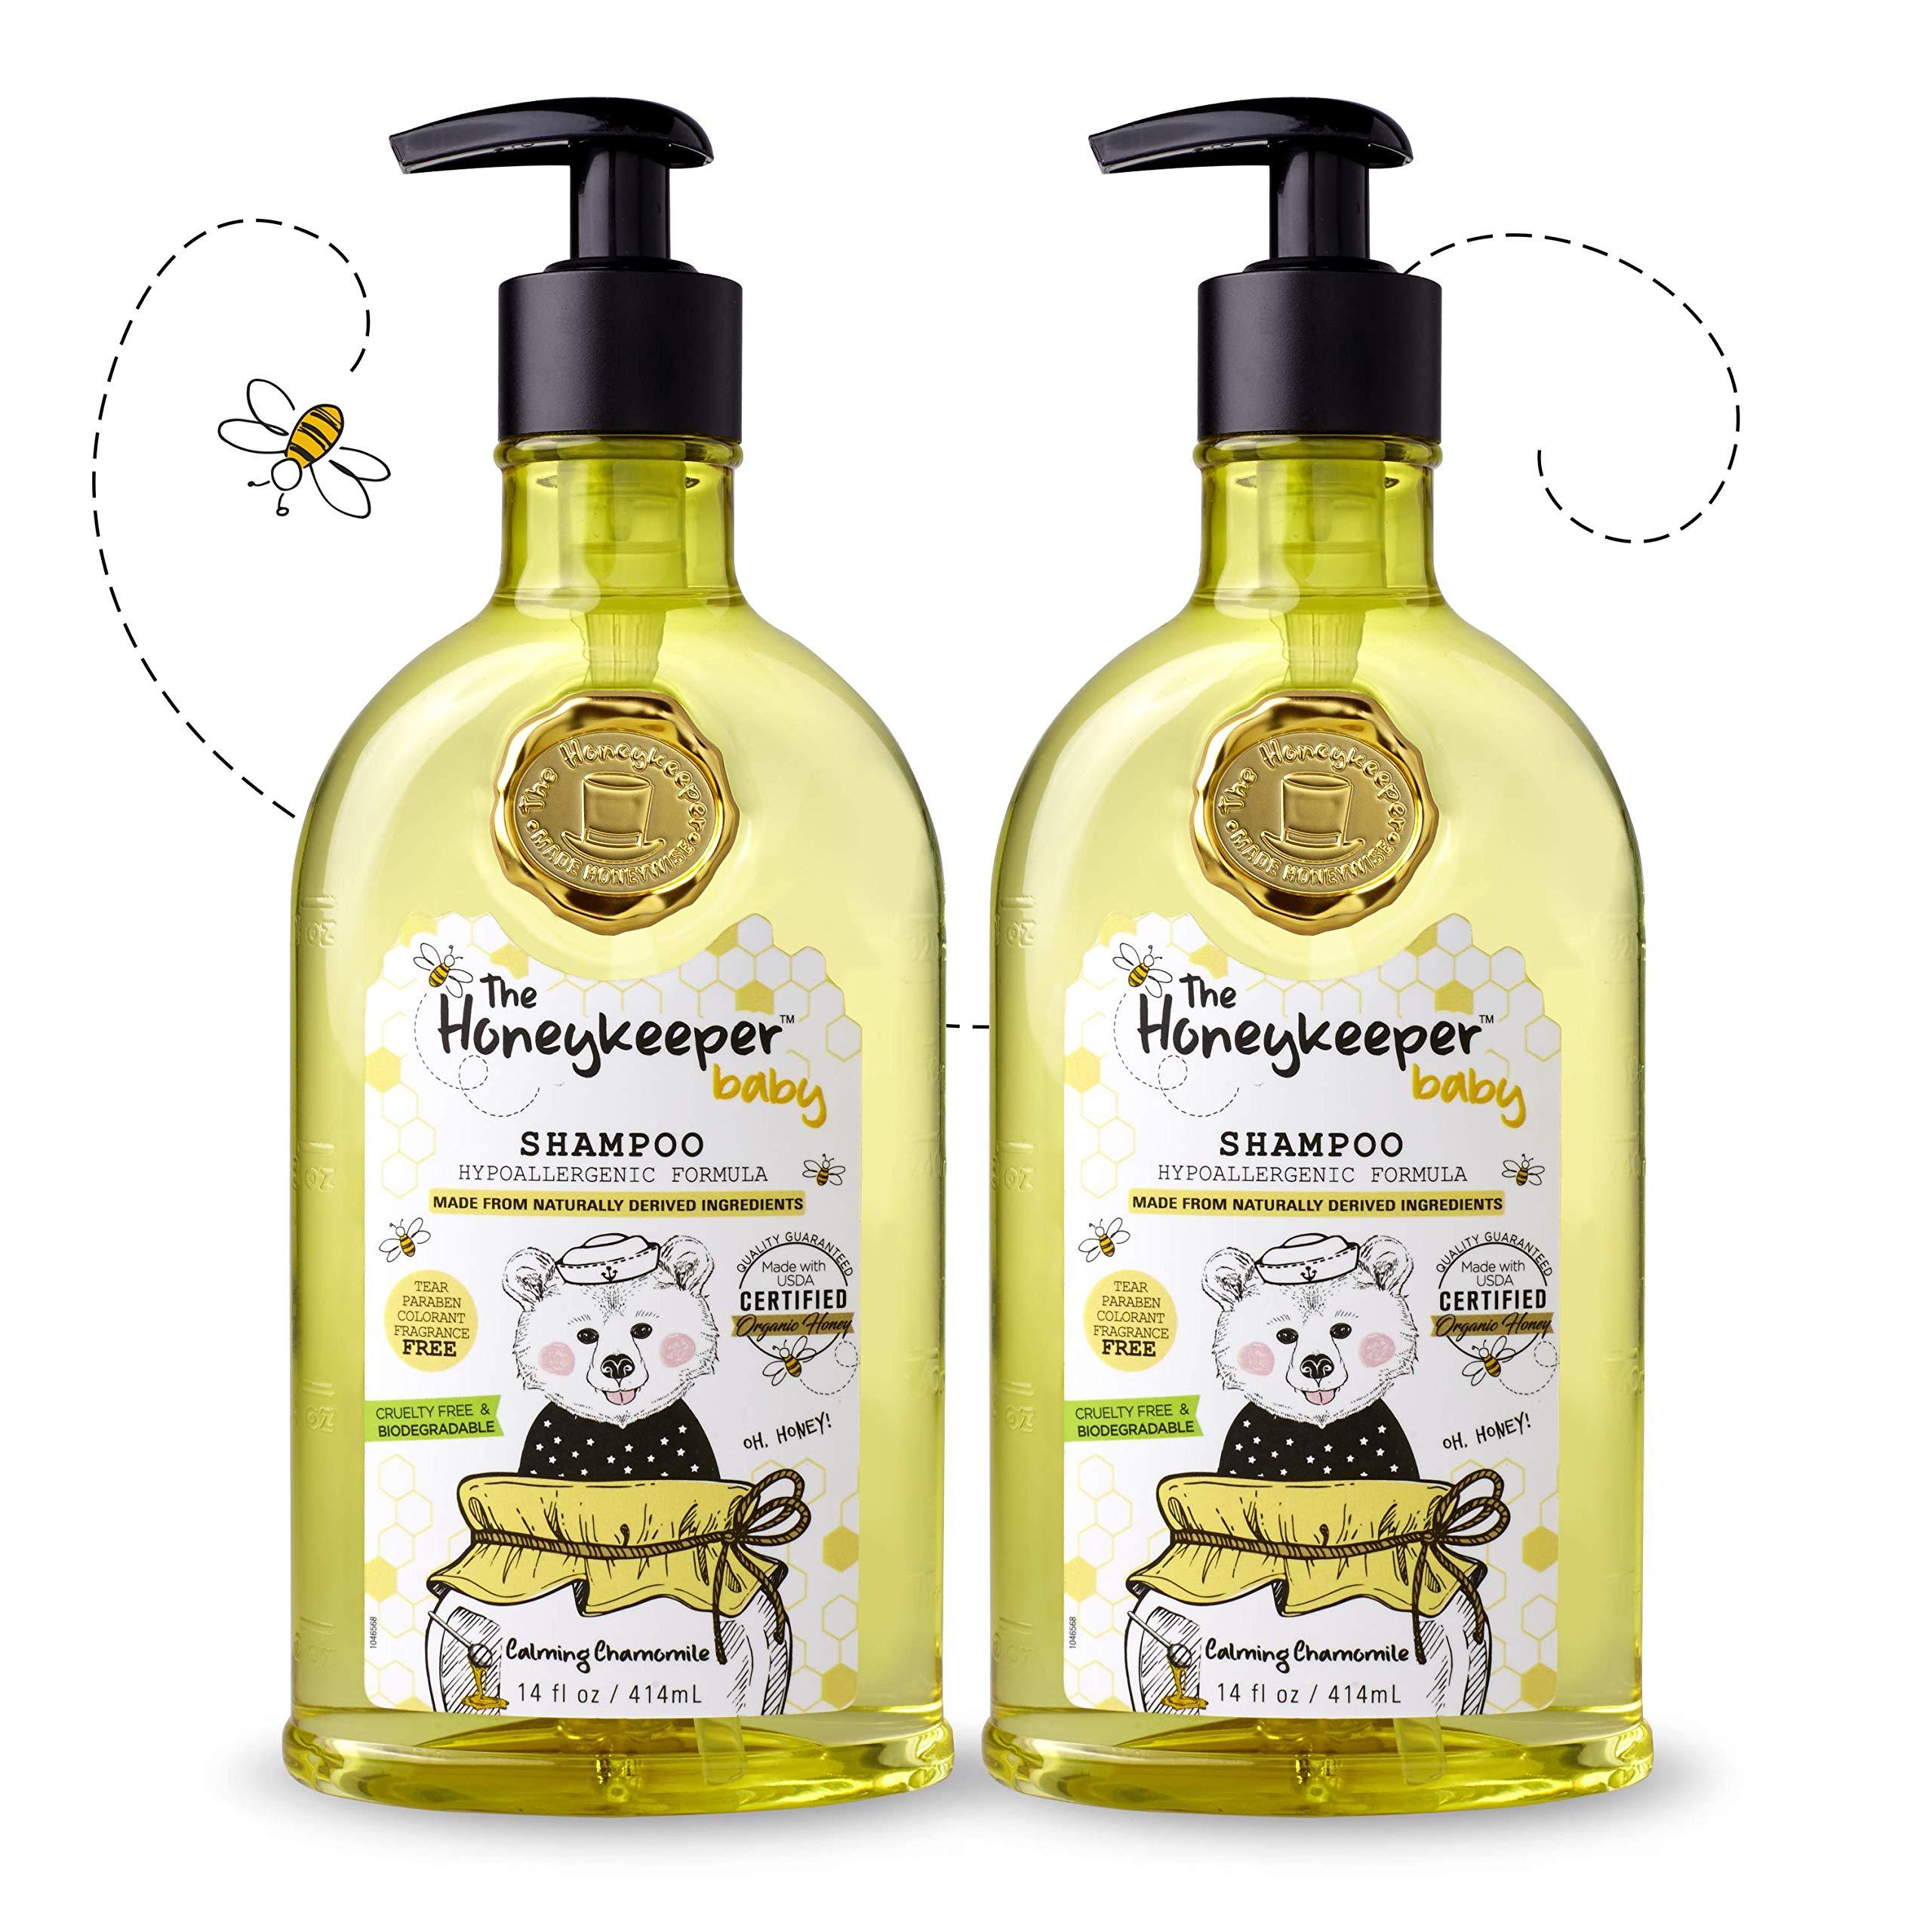 Honeykeeper Baby Shampoo Calming Chamomile, 14 fl.oz. 2pk by The Honeykeeper